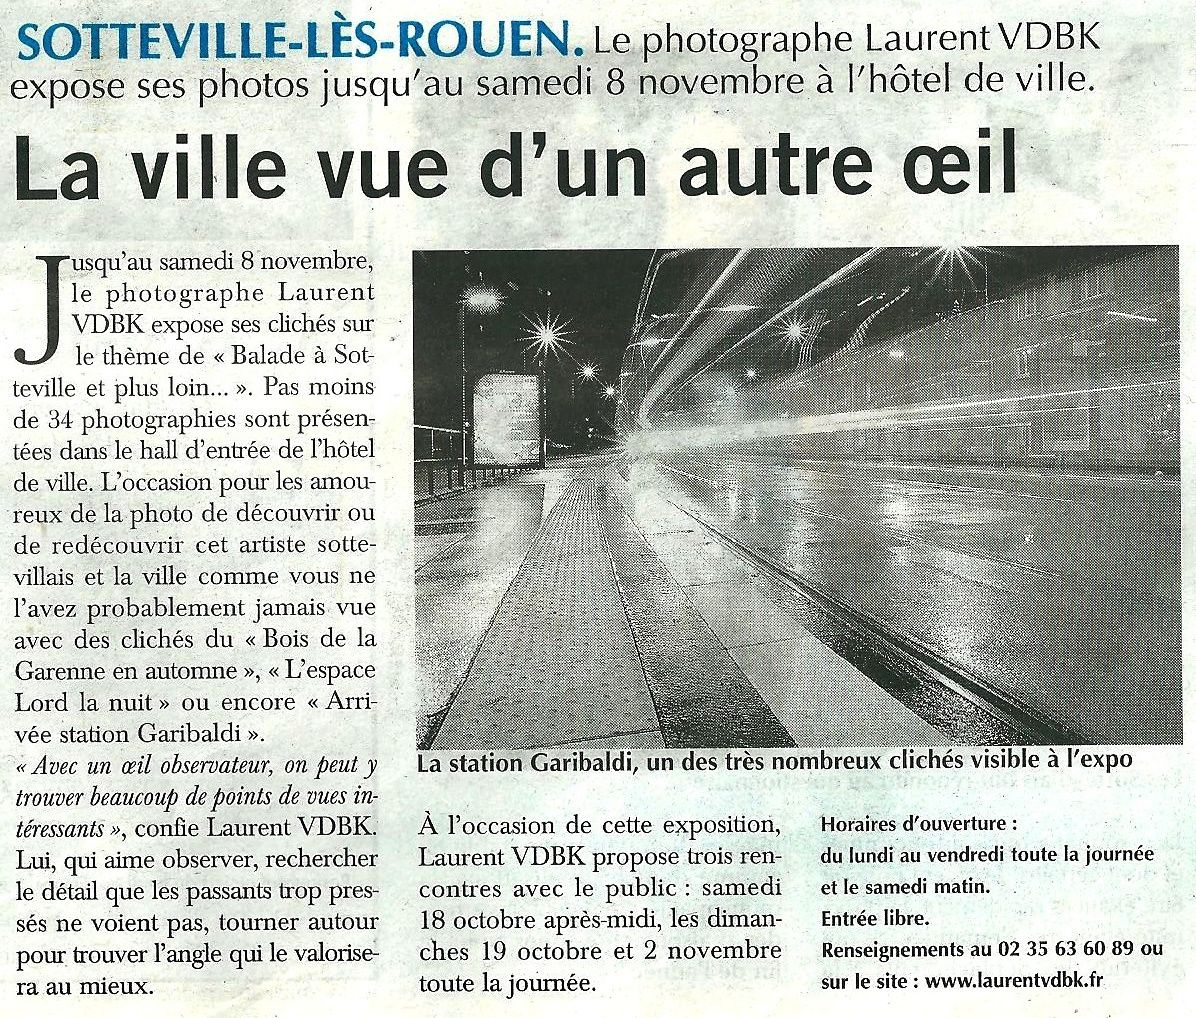 Paris-Normandie-du-17-oct-2014-copie-2.jpg